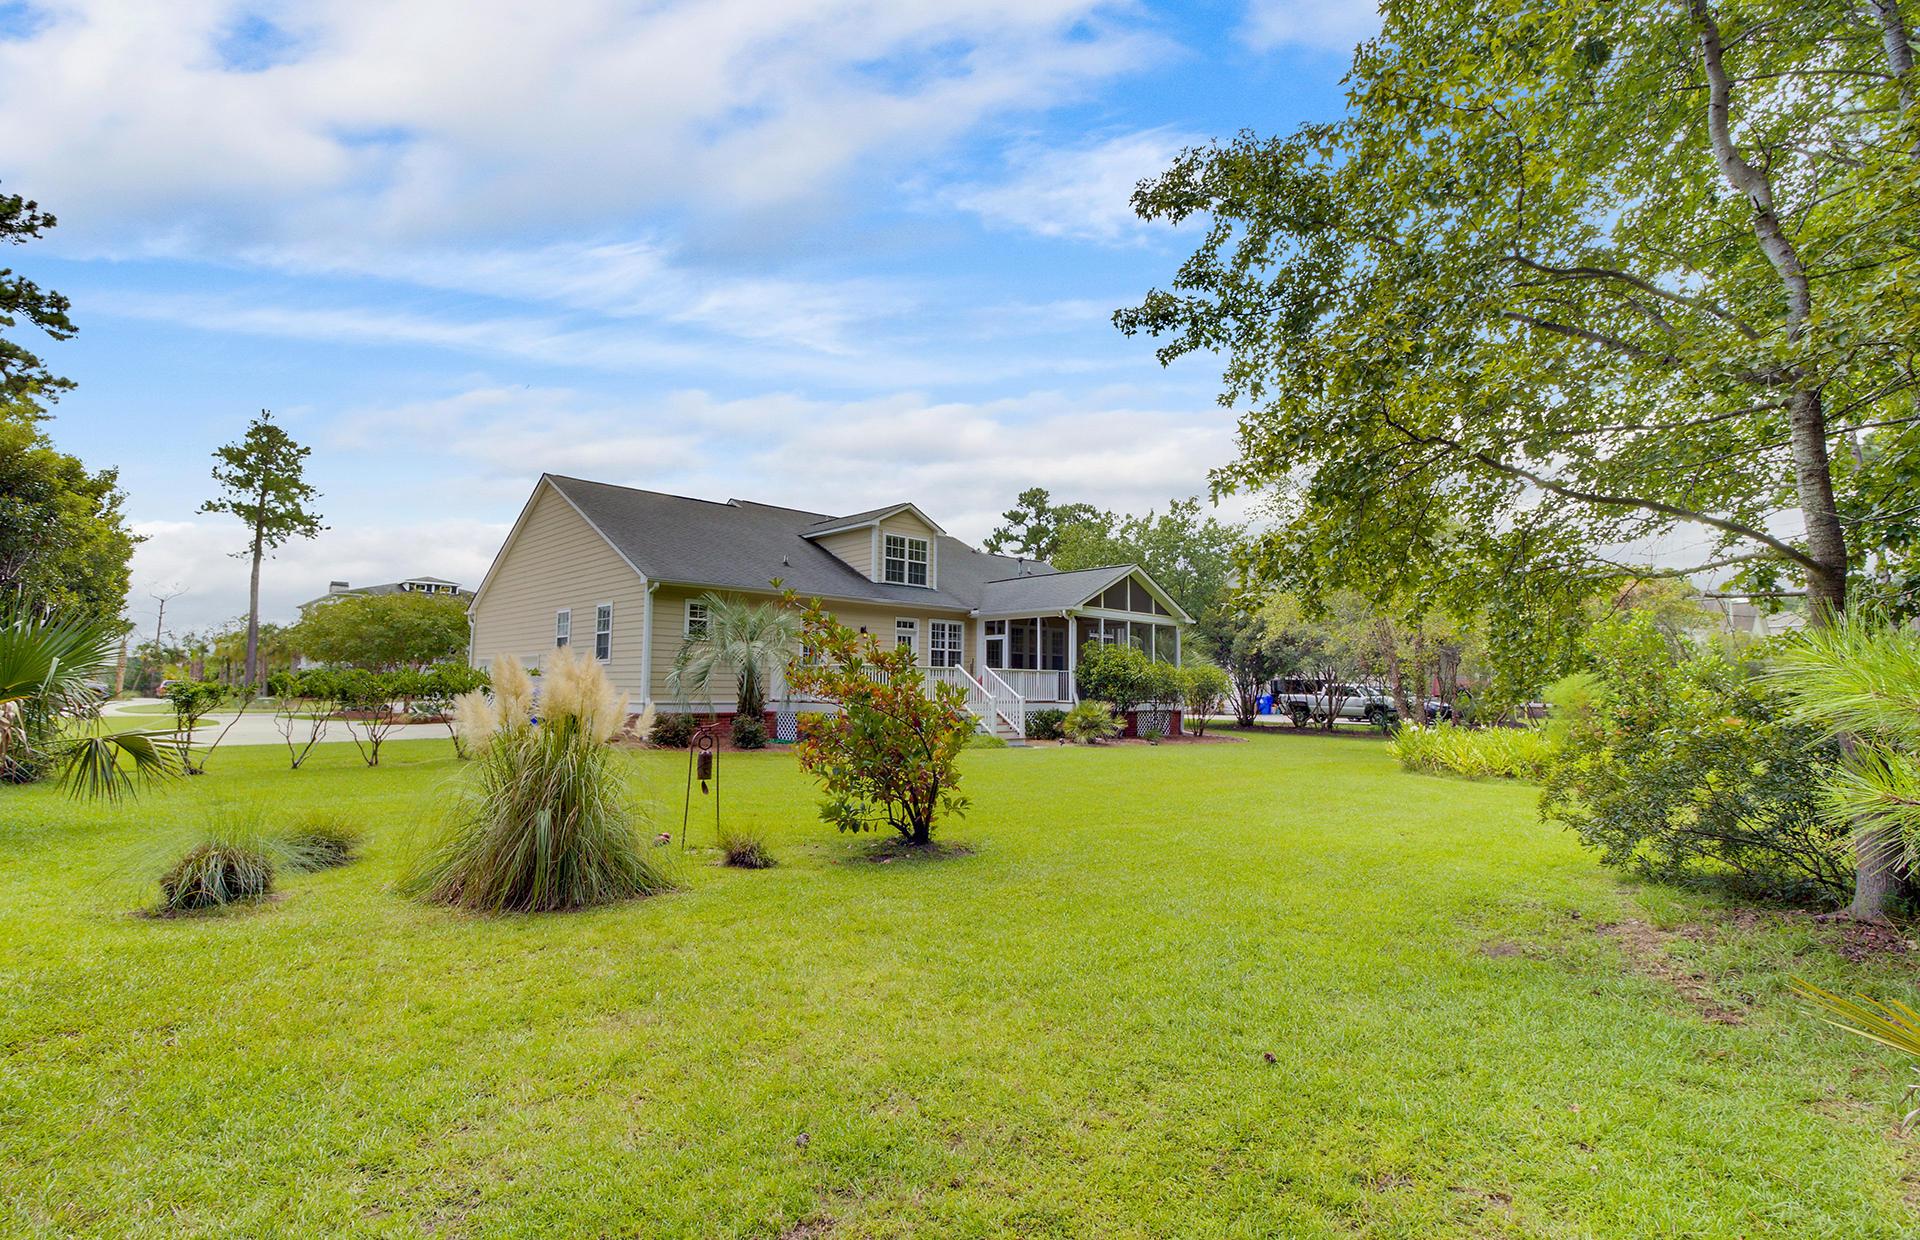 Dunes West Homes For Sale - 2453 Darts Cove, Mount Pleasant, SC - 15